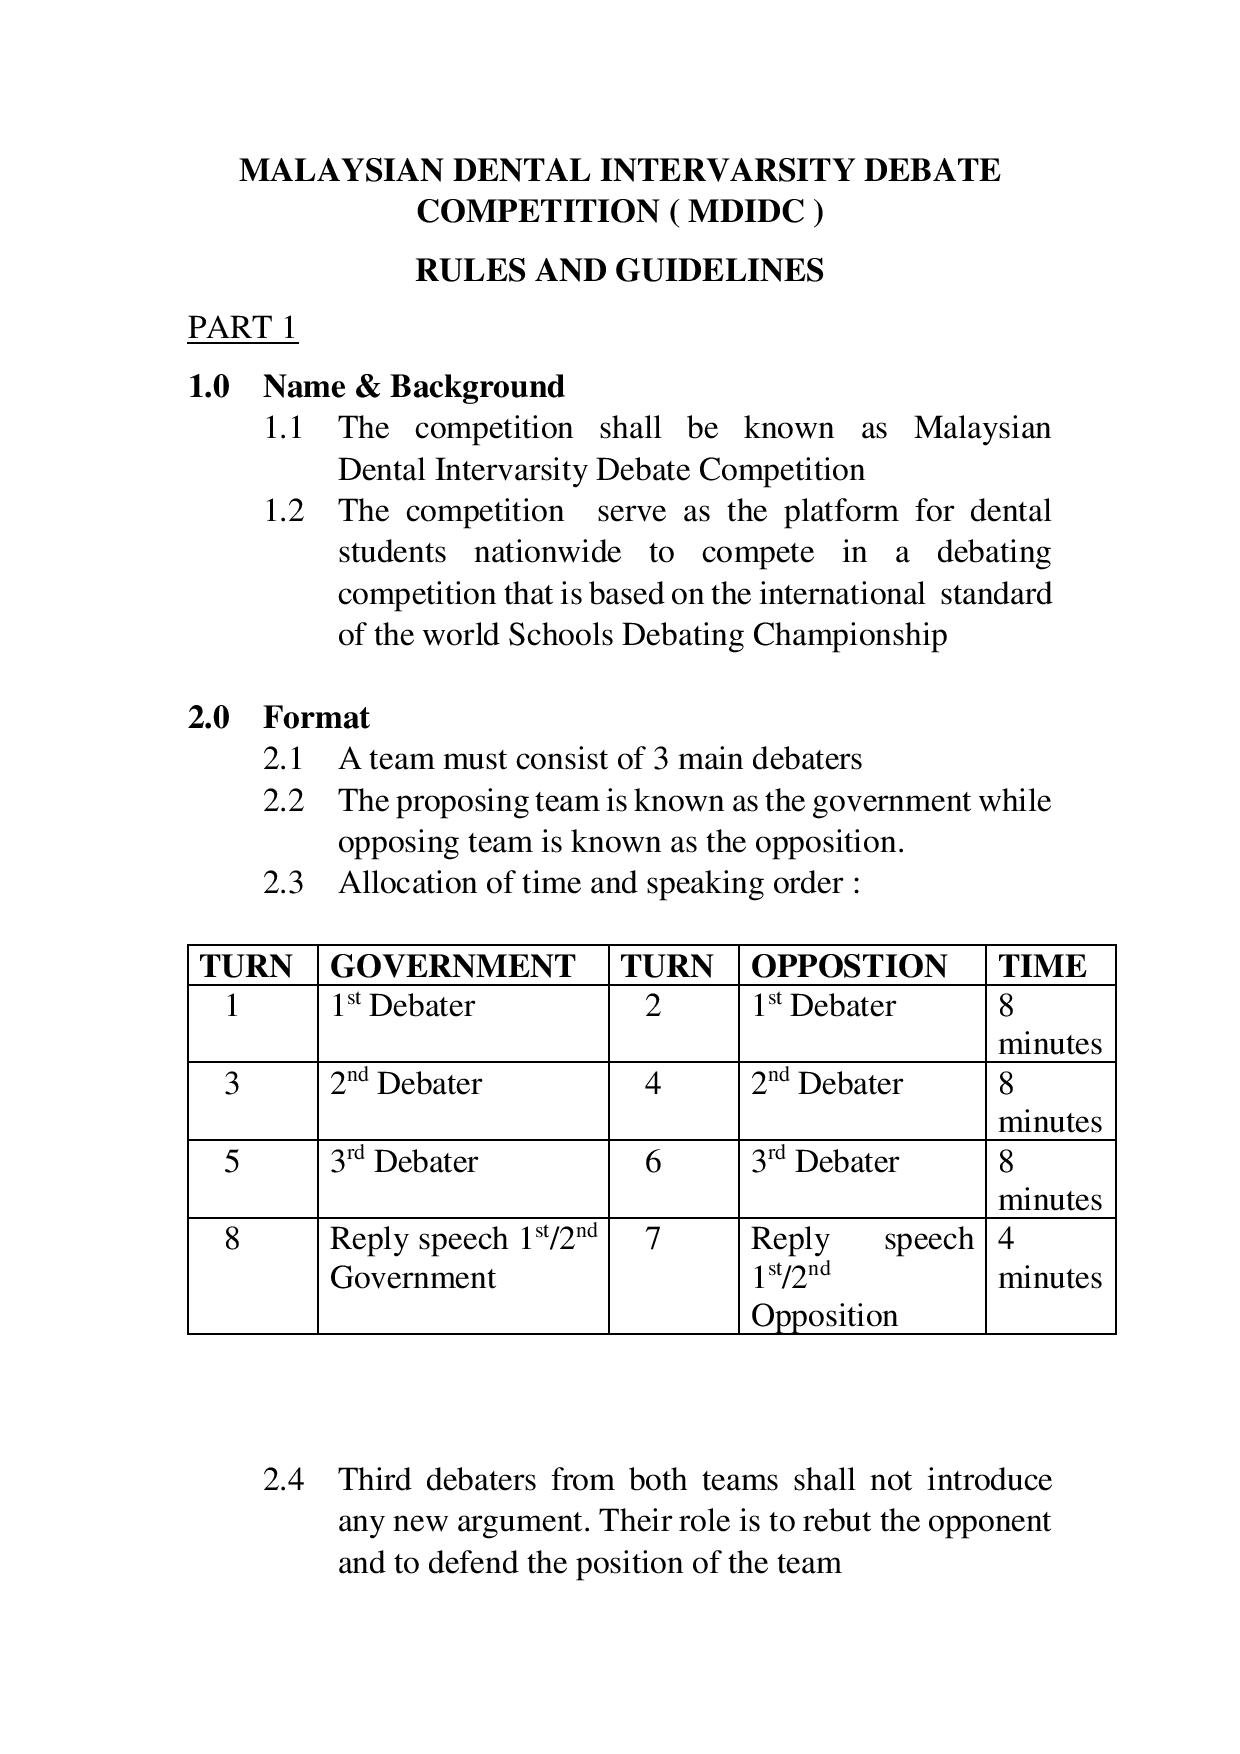 MALAYSIAN DENTAL INTERVARSITY DEBATE COMPETITION (Edited)-page-002.jpg